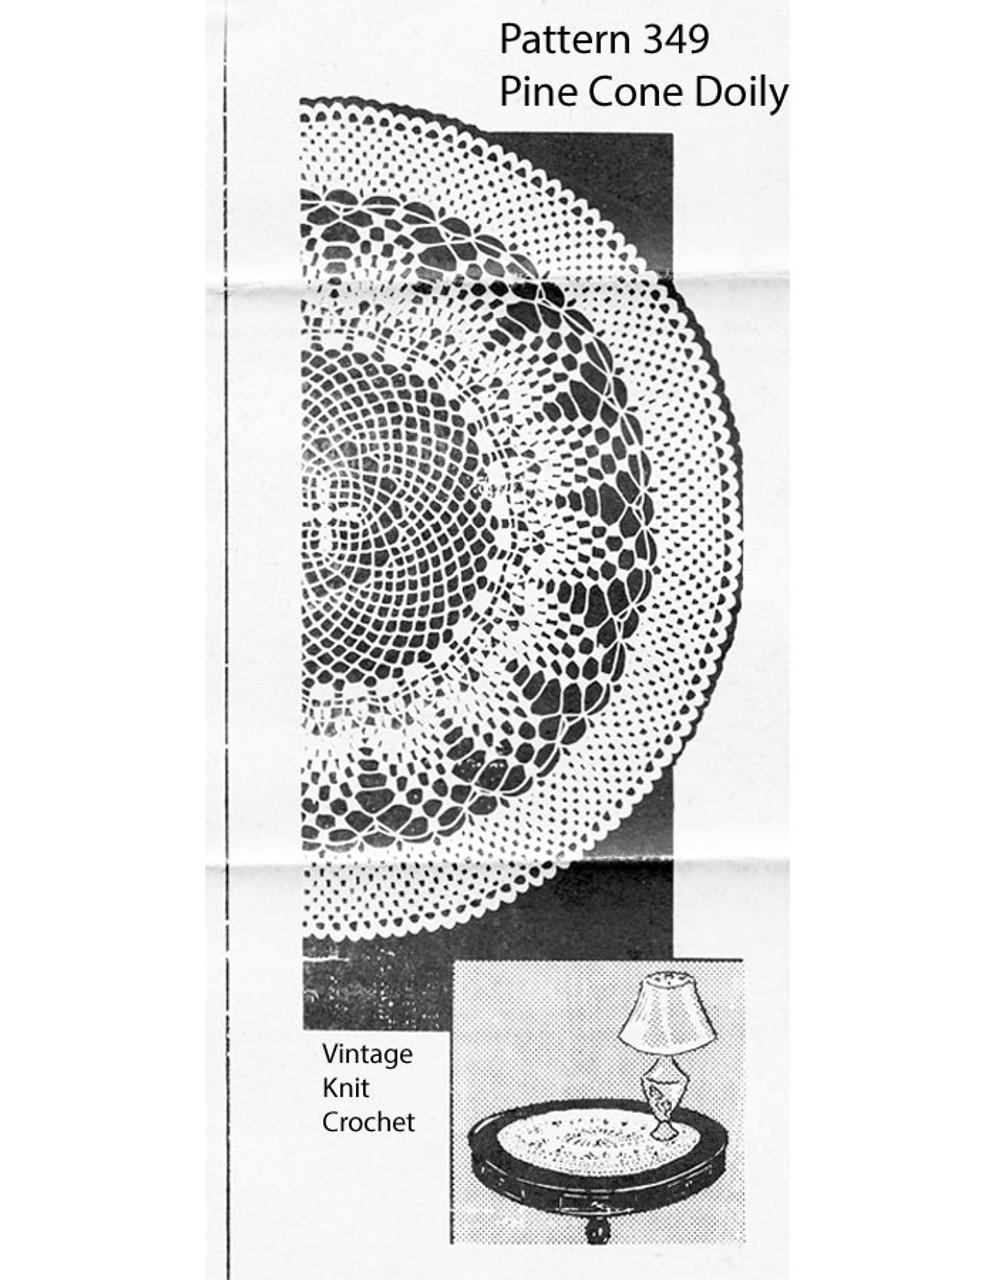 Crochet Centerpiece Doily Pattern, Carol Curtis 349